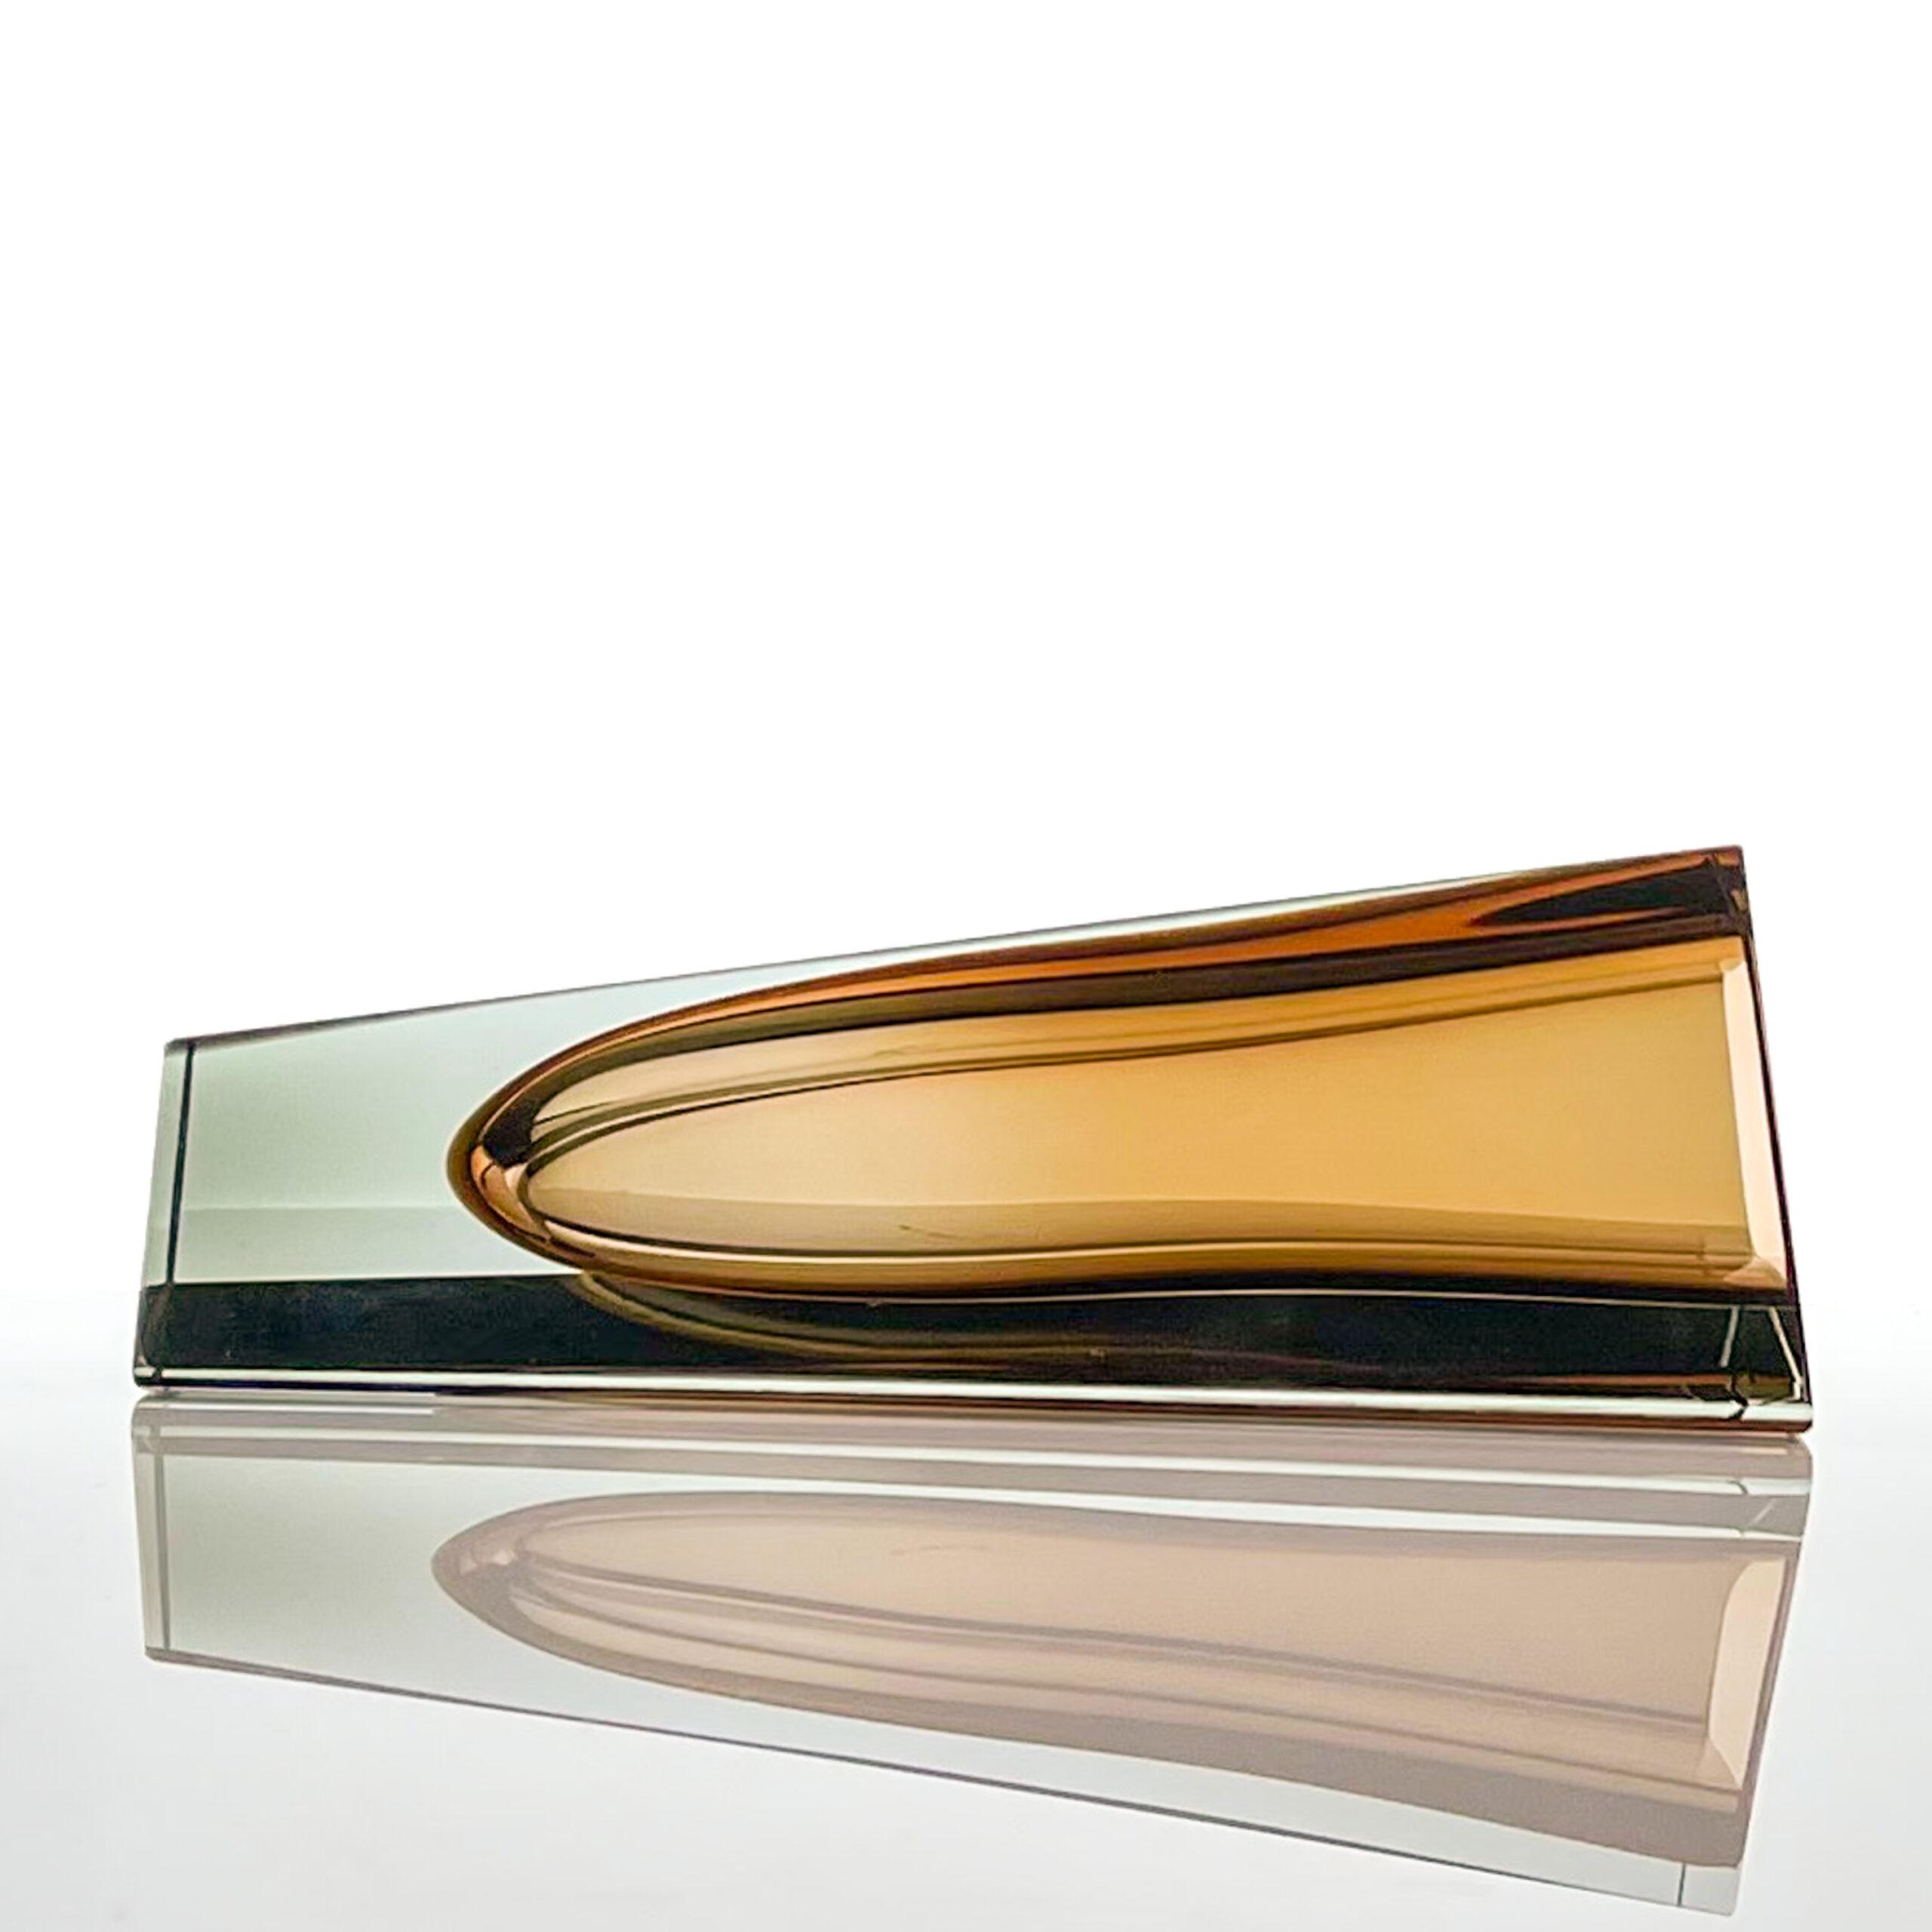 KF Prisma L bruin KF 215 web (10 van 13)